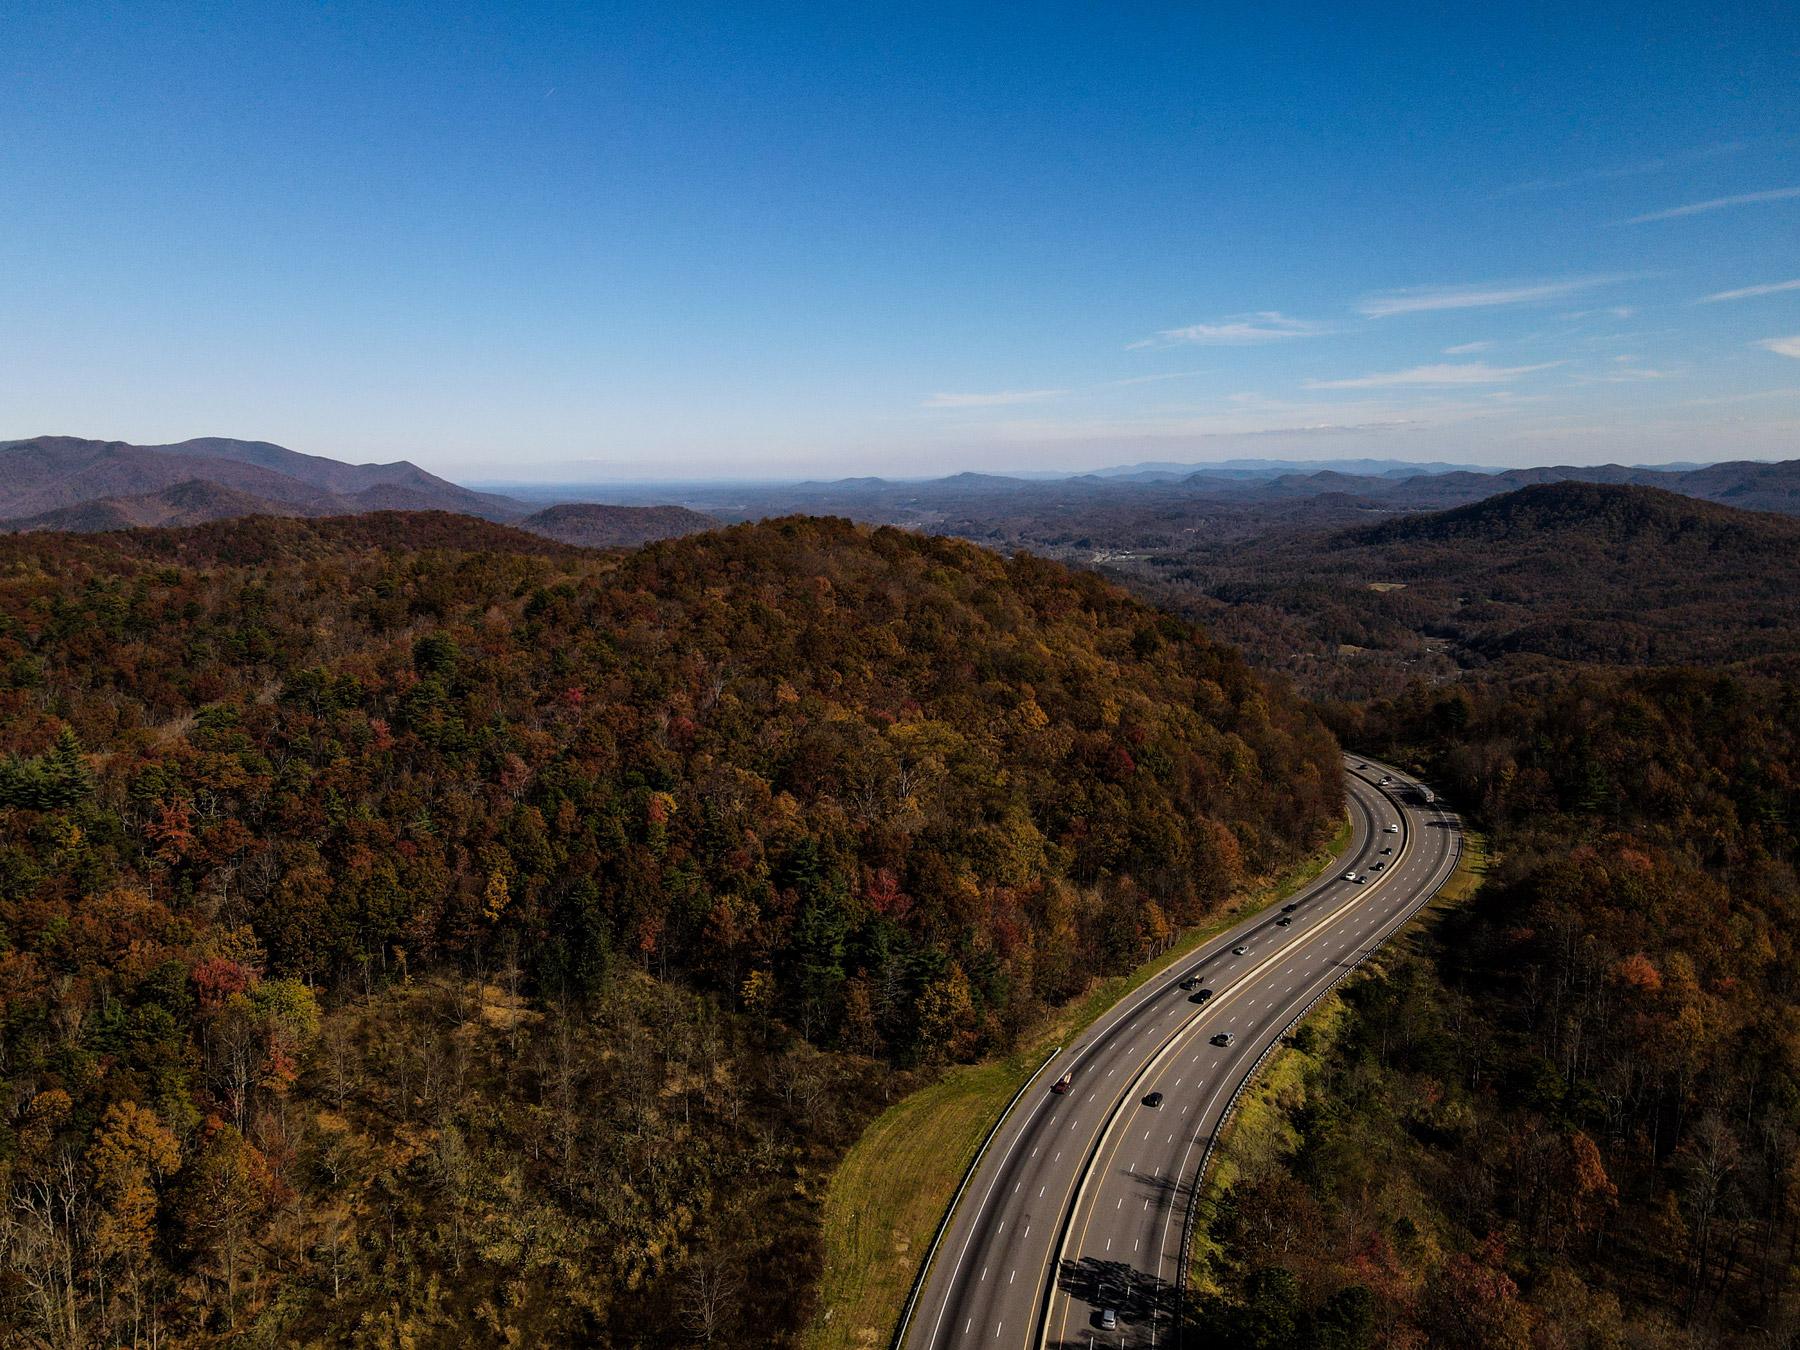 Interstate 40 winding through Black Mountain in North Carolina